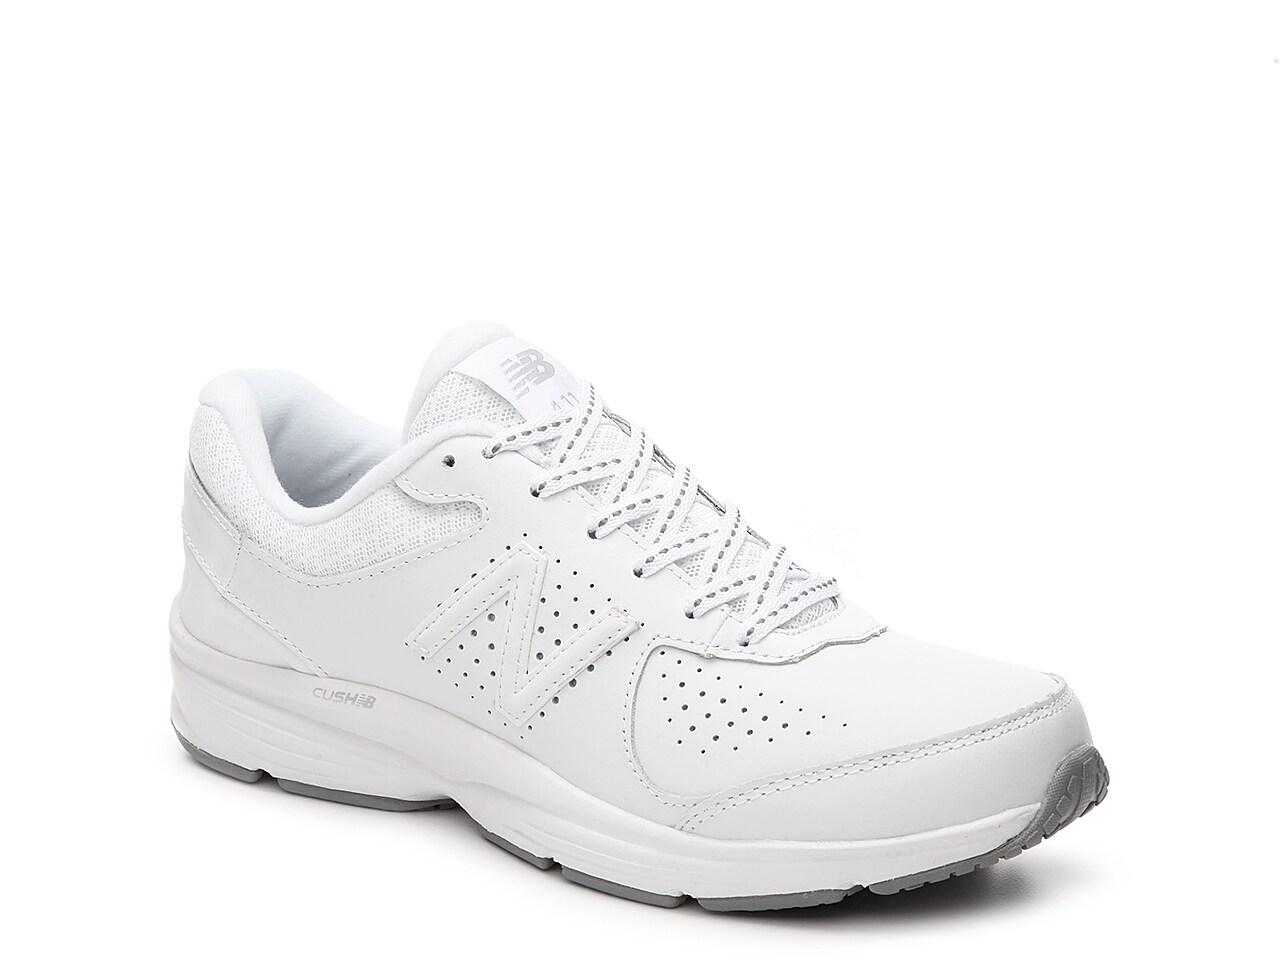 Crítico grano Vaciar la basura  New Balance 411 Walking Shoe - Women's Women's Shoes | DSW